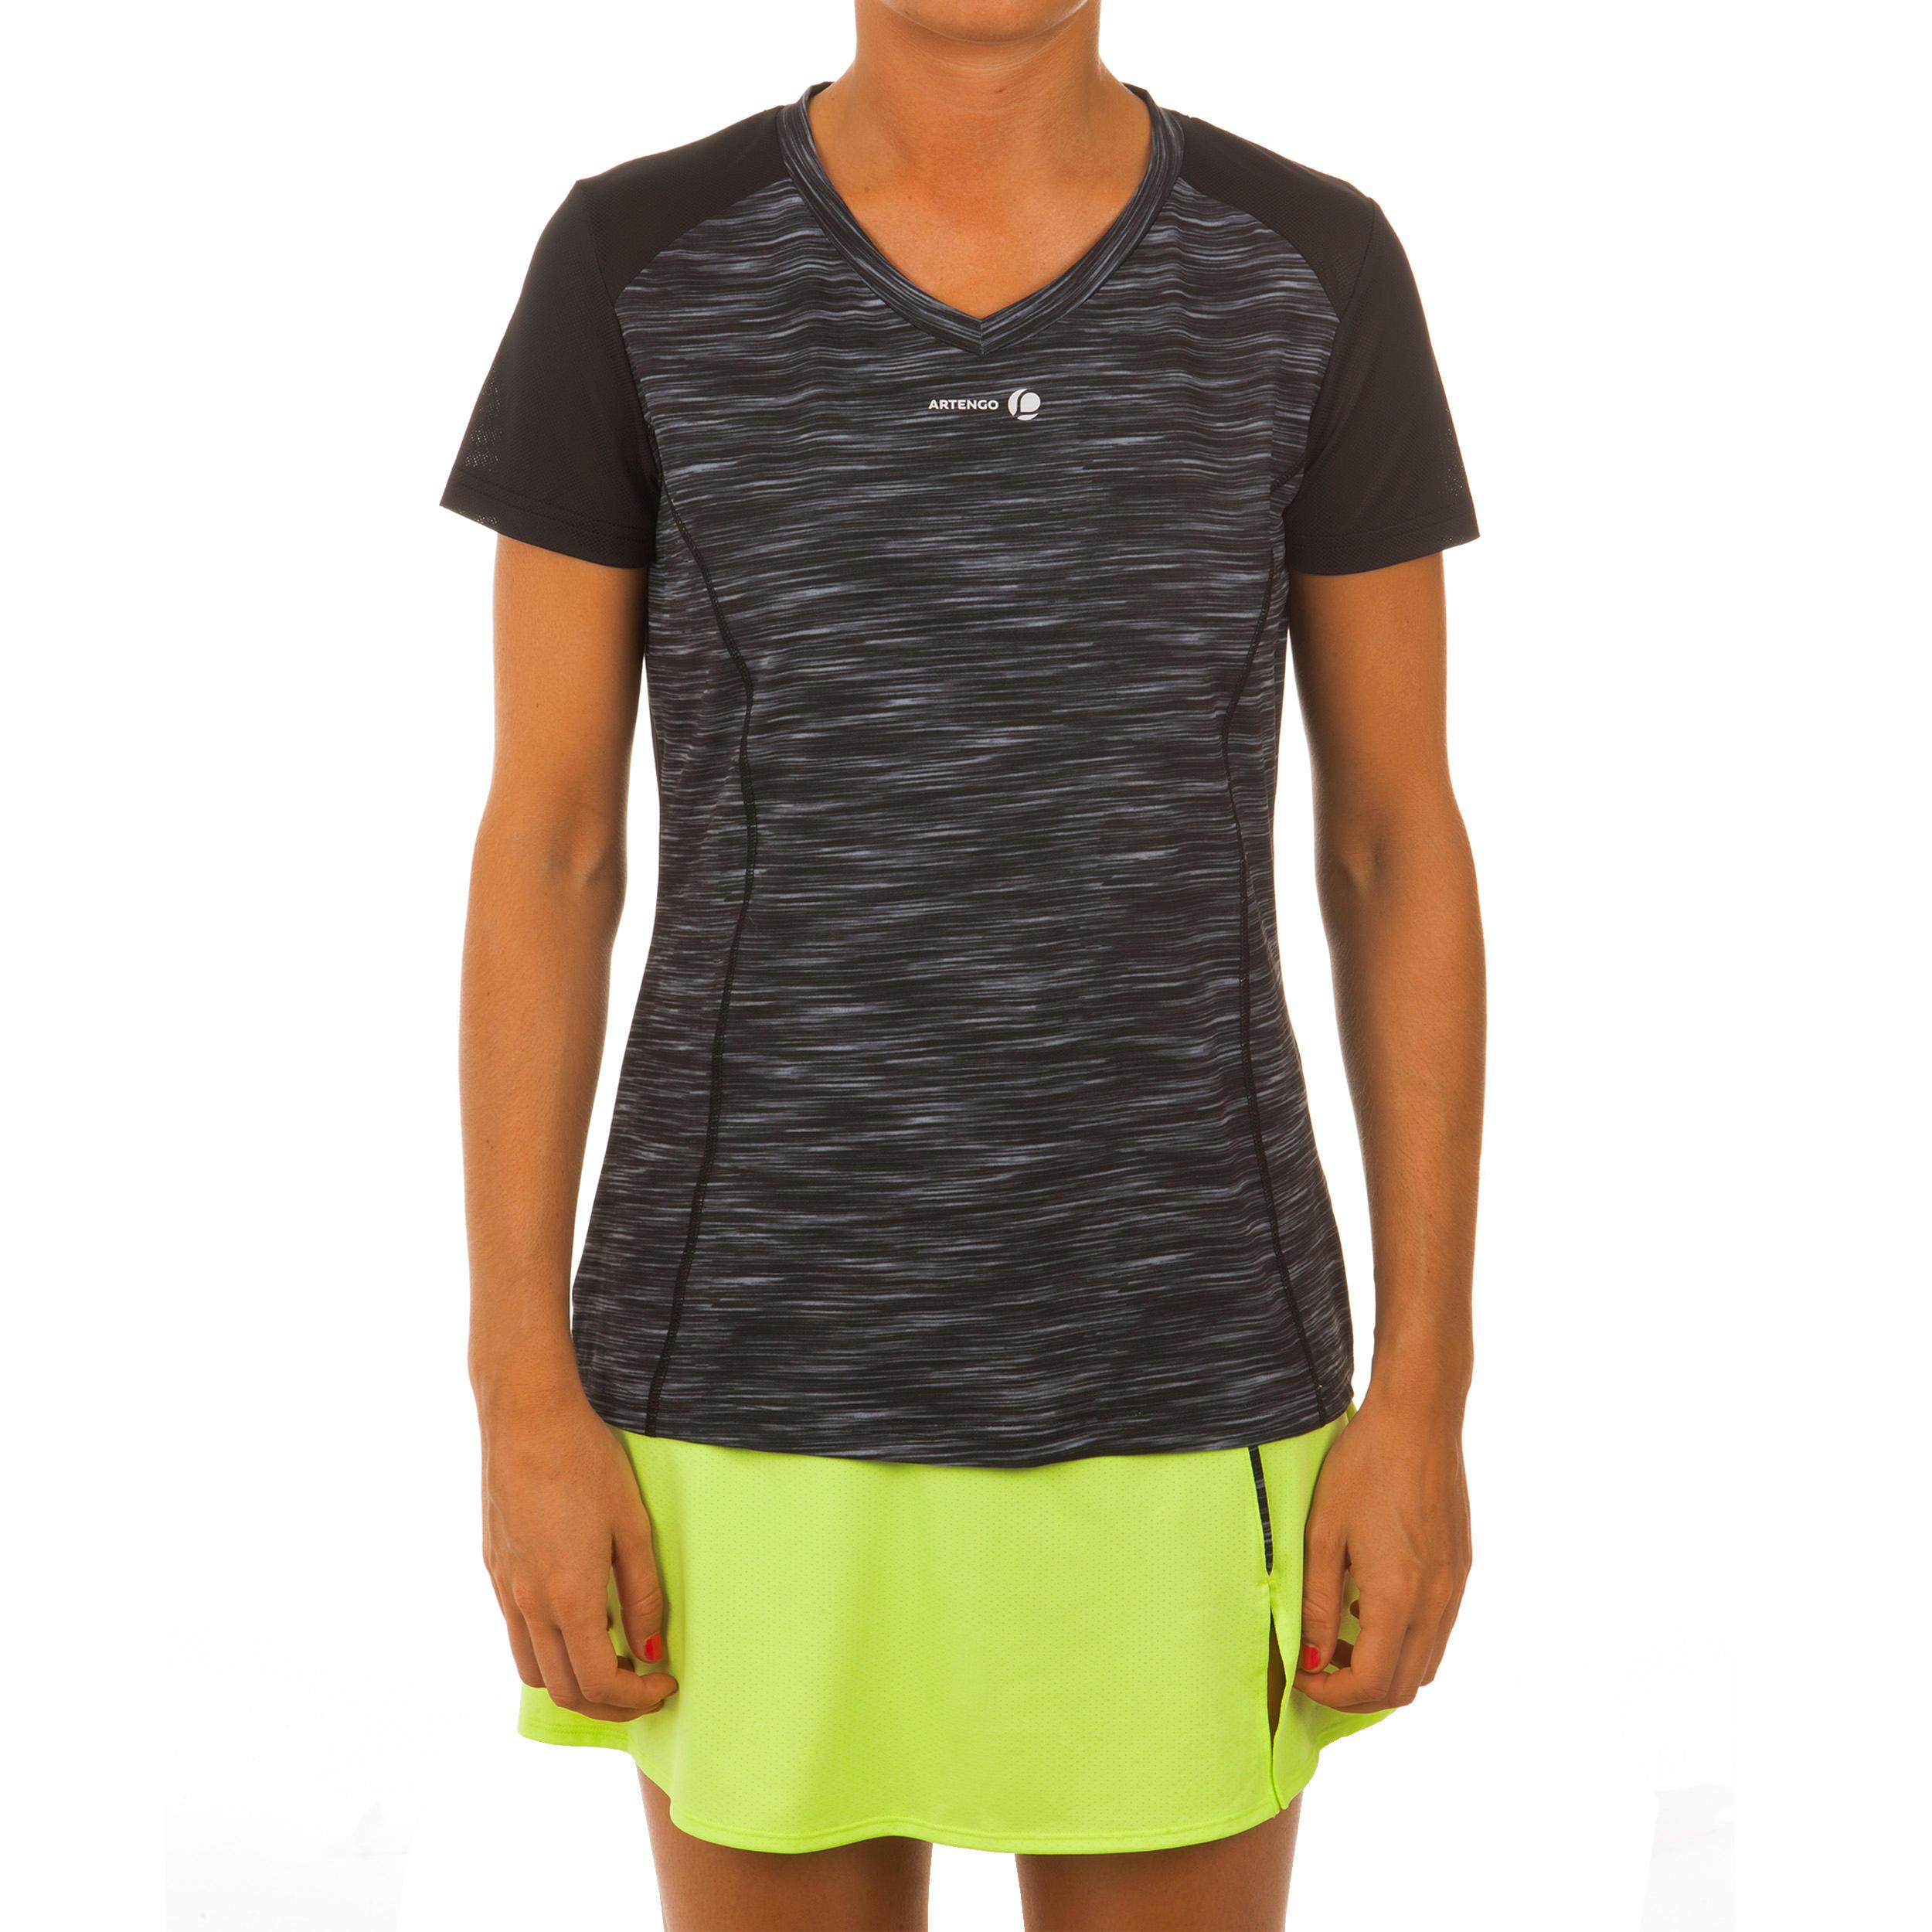 Women's Tennis T-Shirt - Soft 500 Grey/Black